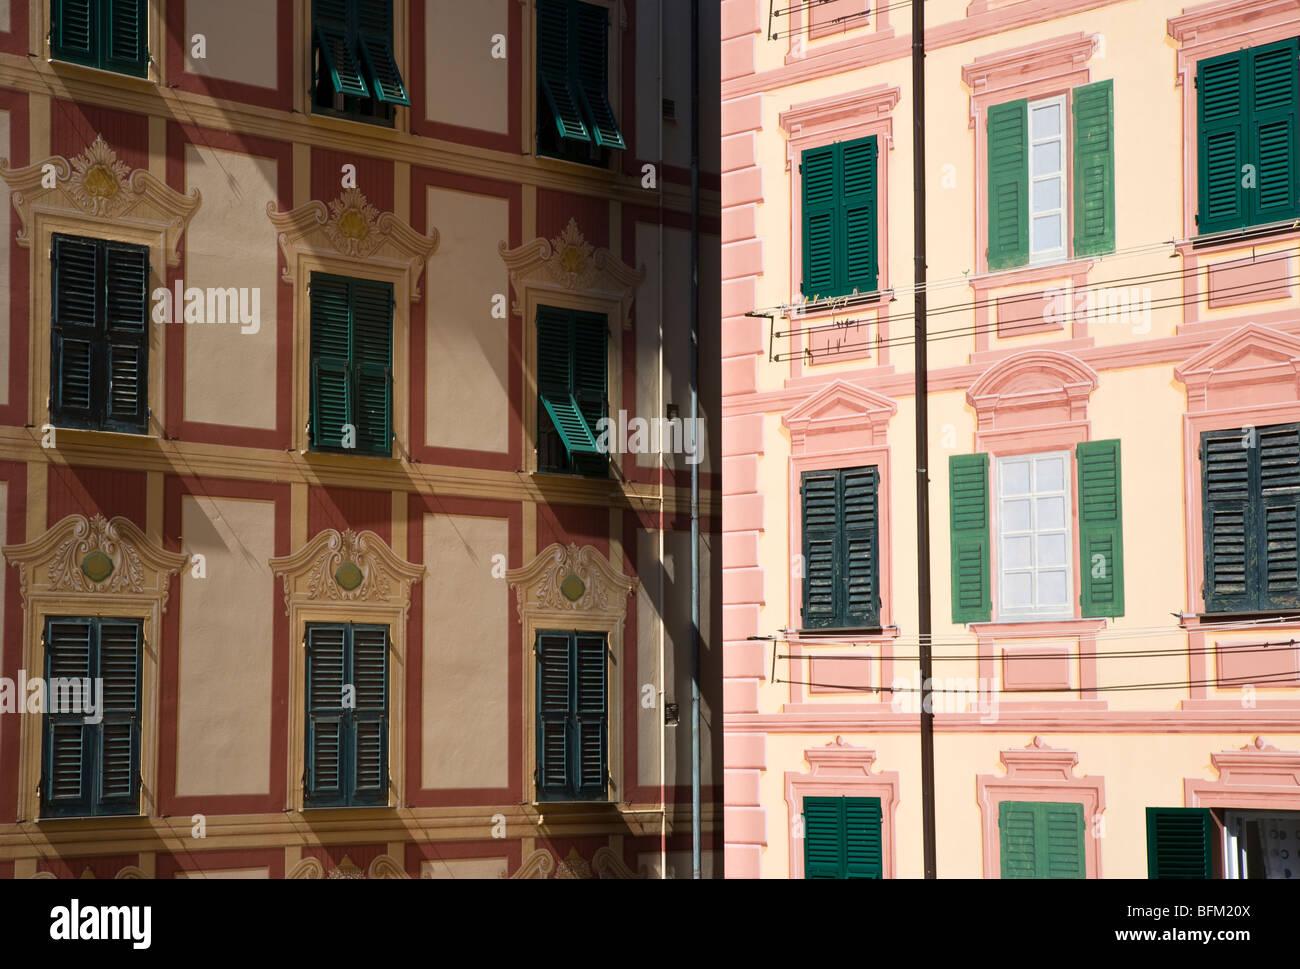 Tromp l'oeil buildings, Camogli, Liguria, Italy - Stock Image